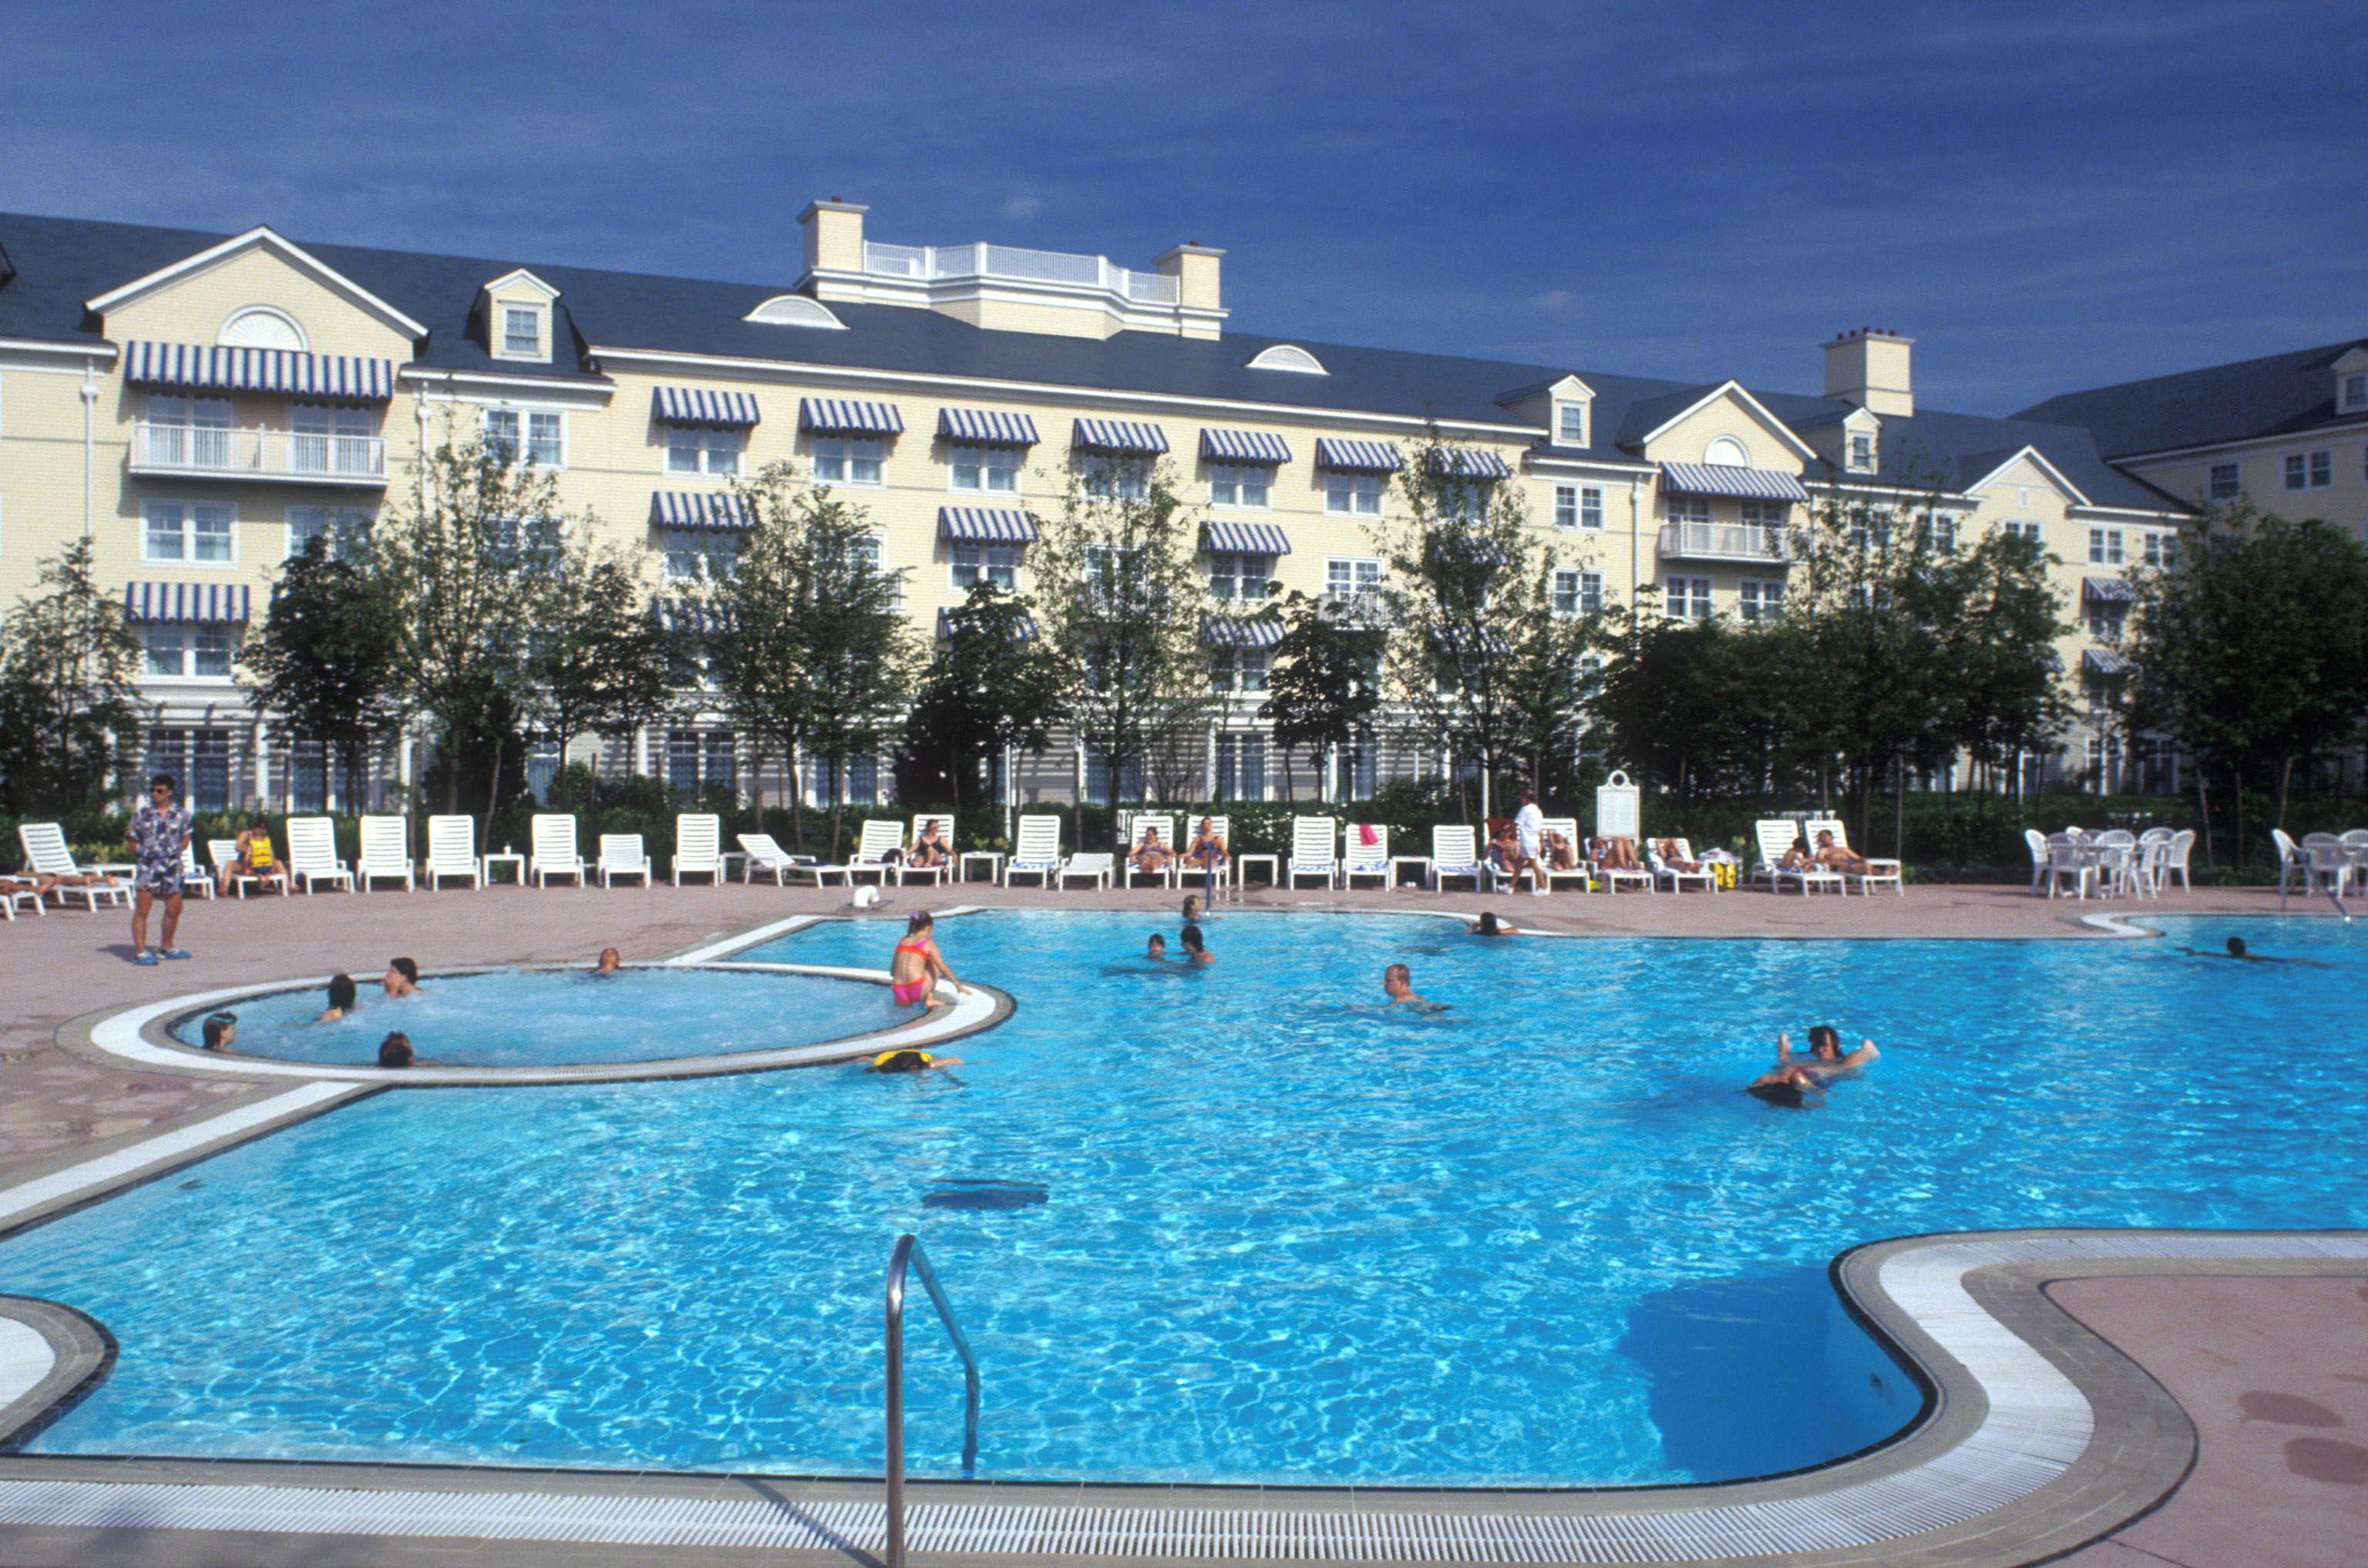 Disney Hotels Newport Bay Club - Outdoor Pool Disneyland